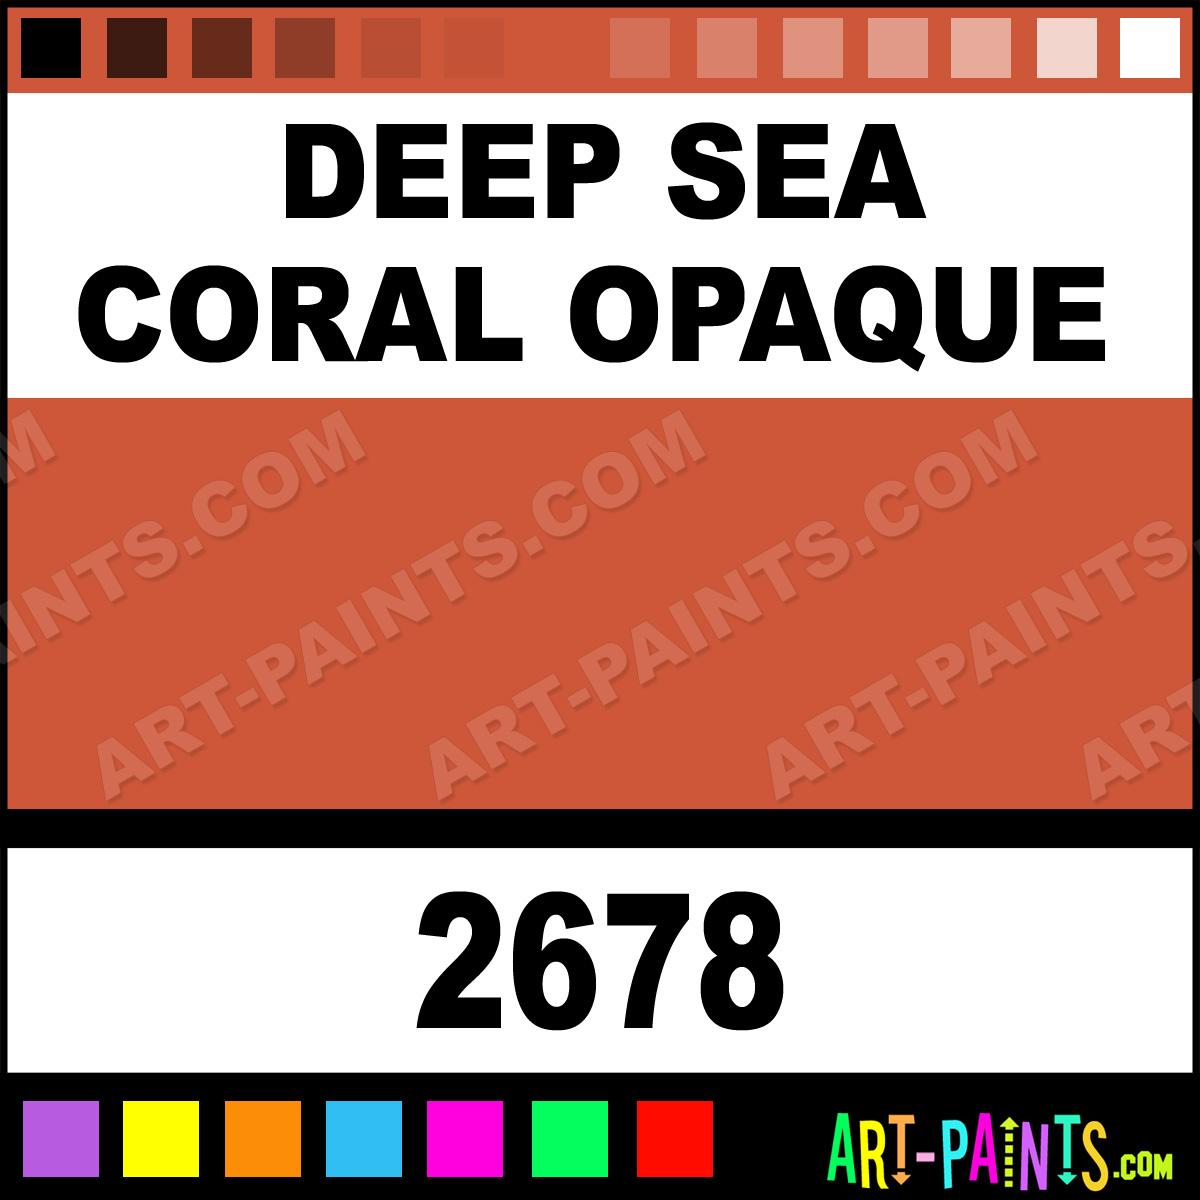 Deep sea coral opaque ceramcoat acrylic paints 2678 deep sea deep sea coral nvjuhfo Choice Image